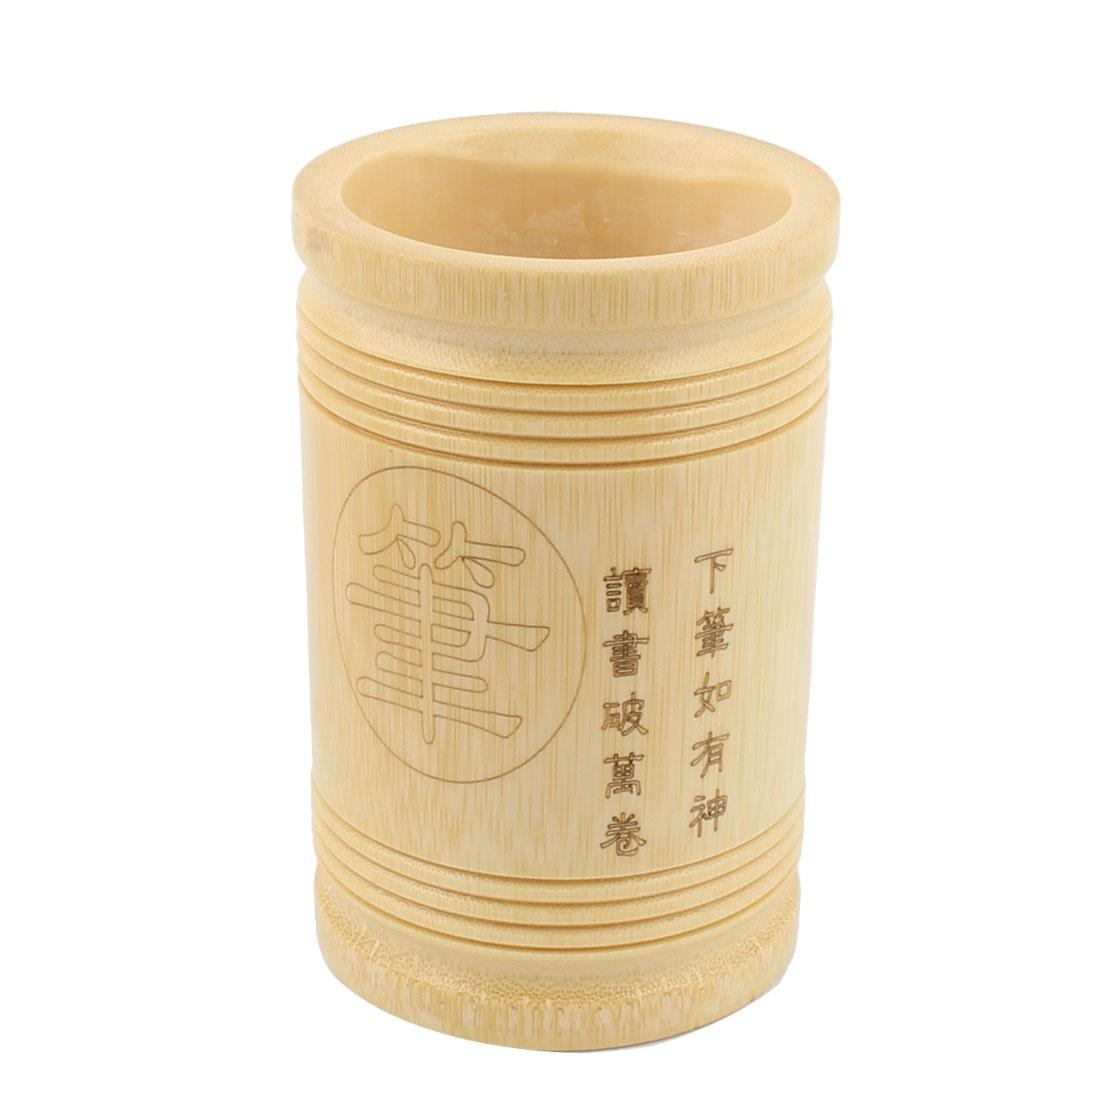 Wood Cylindrical Shape Chinese Style Stationery Pencil Pen Holder Desk Organizer